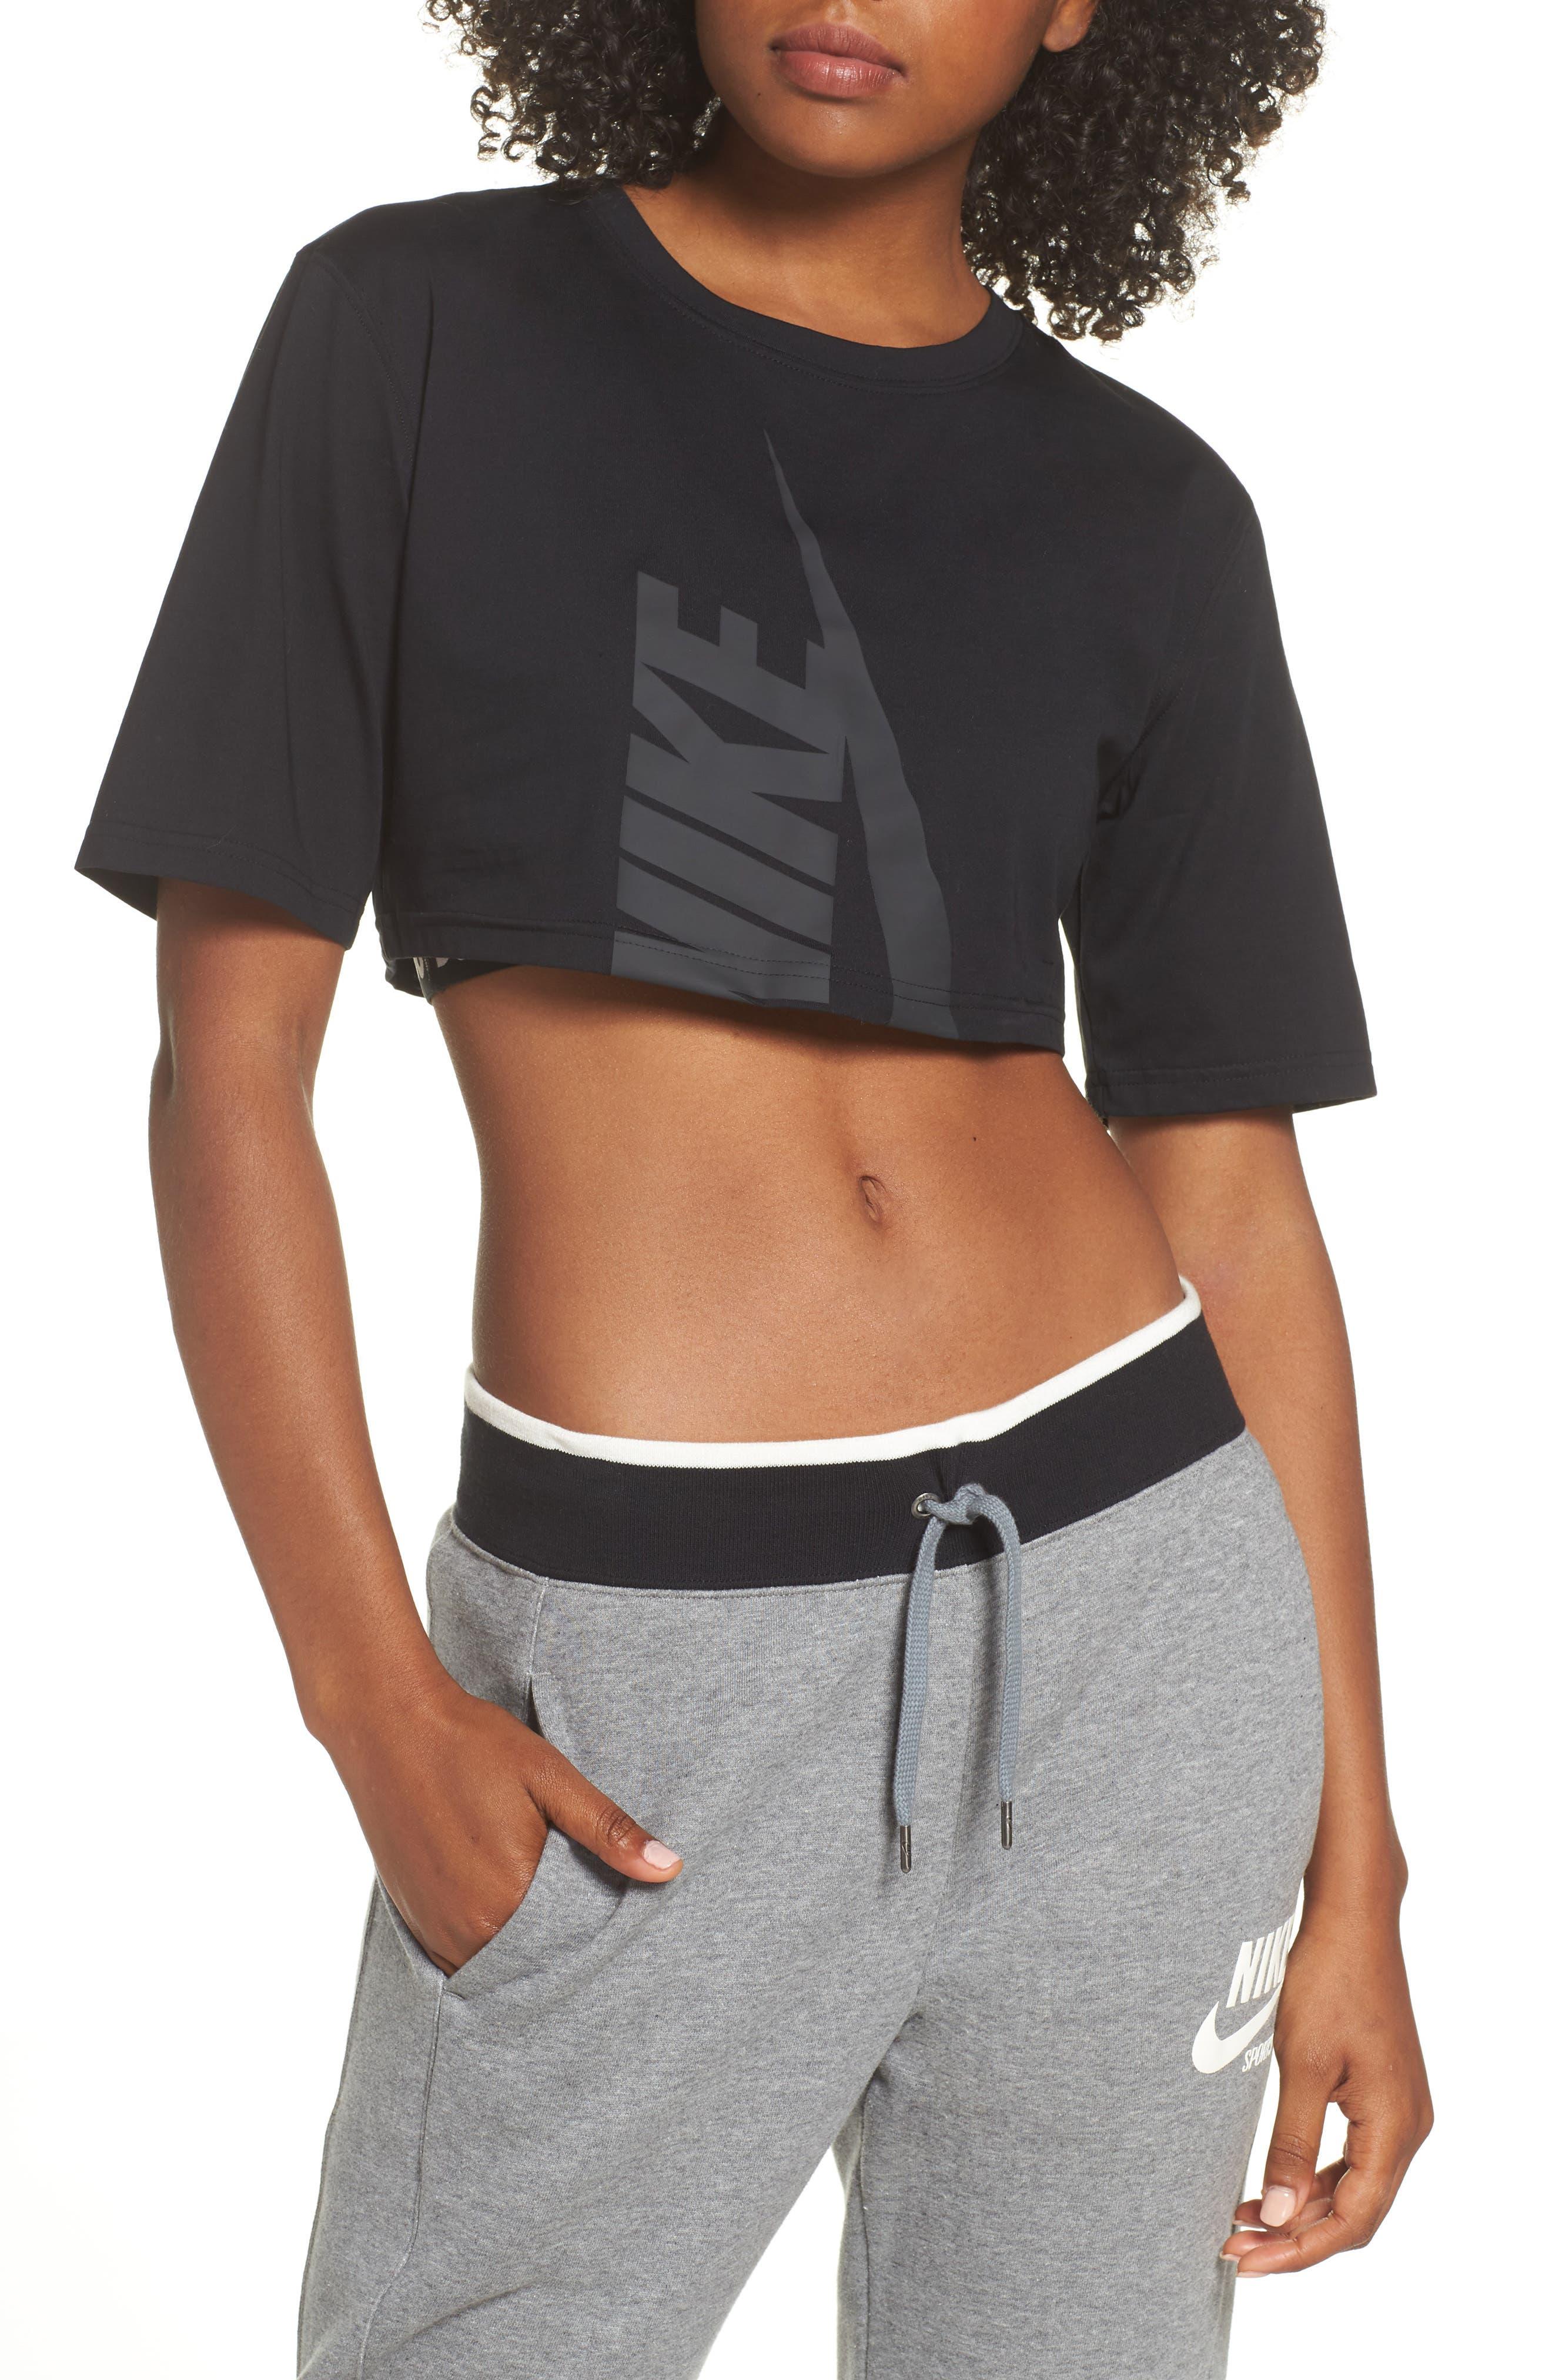 NikeLab Collection Jersey Crop Top,                             Main thumbnail 1, color,                             BLACK/ BLACK